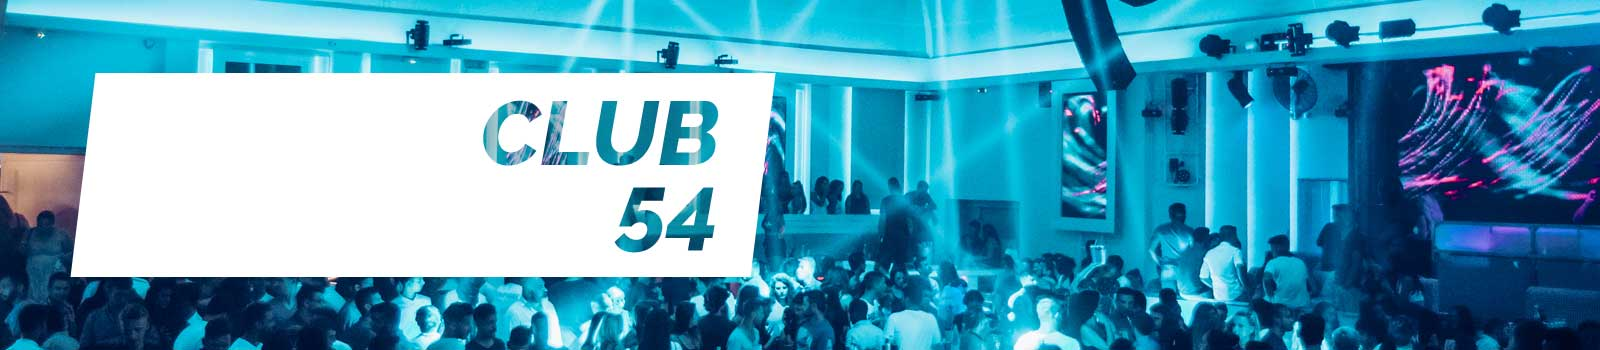 Club 54 - Corfù